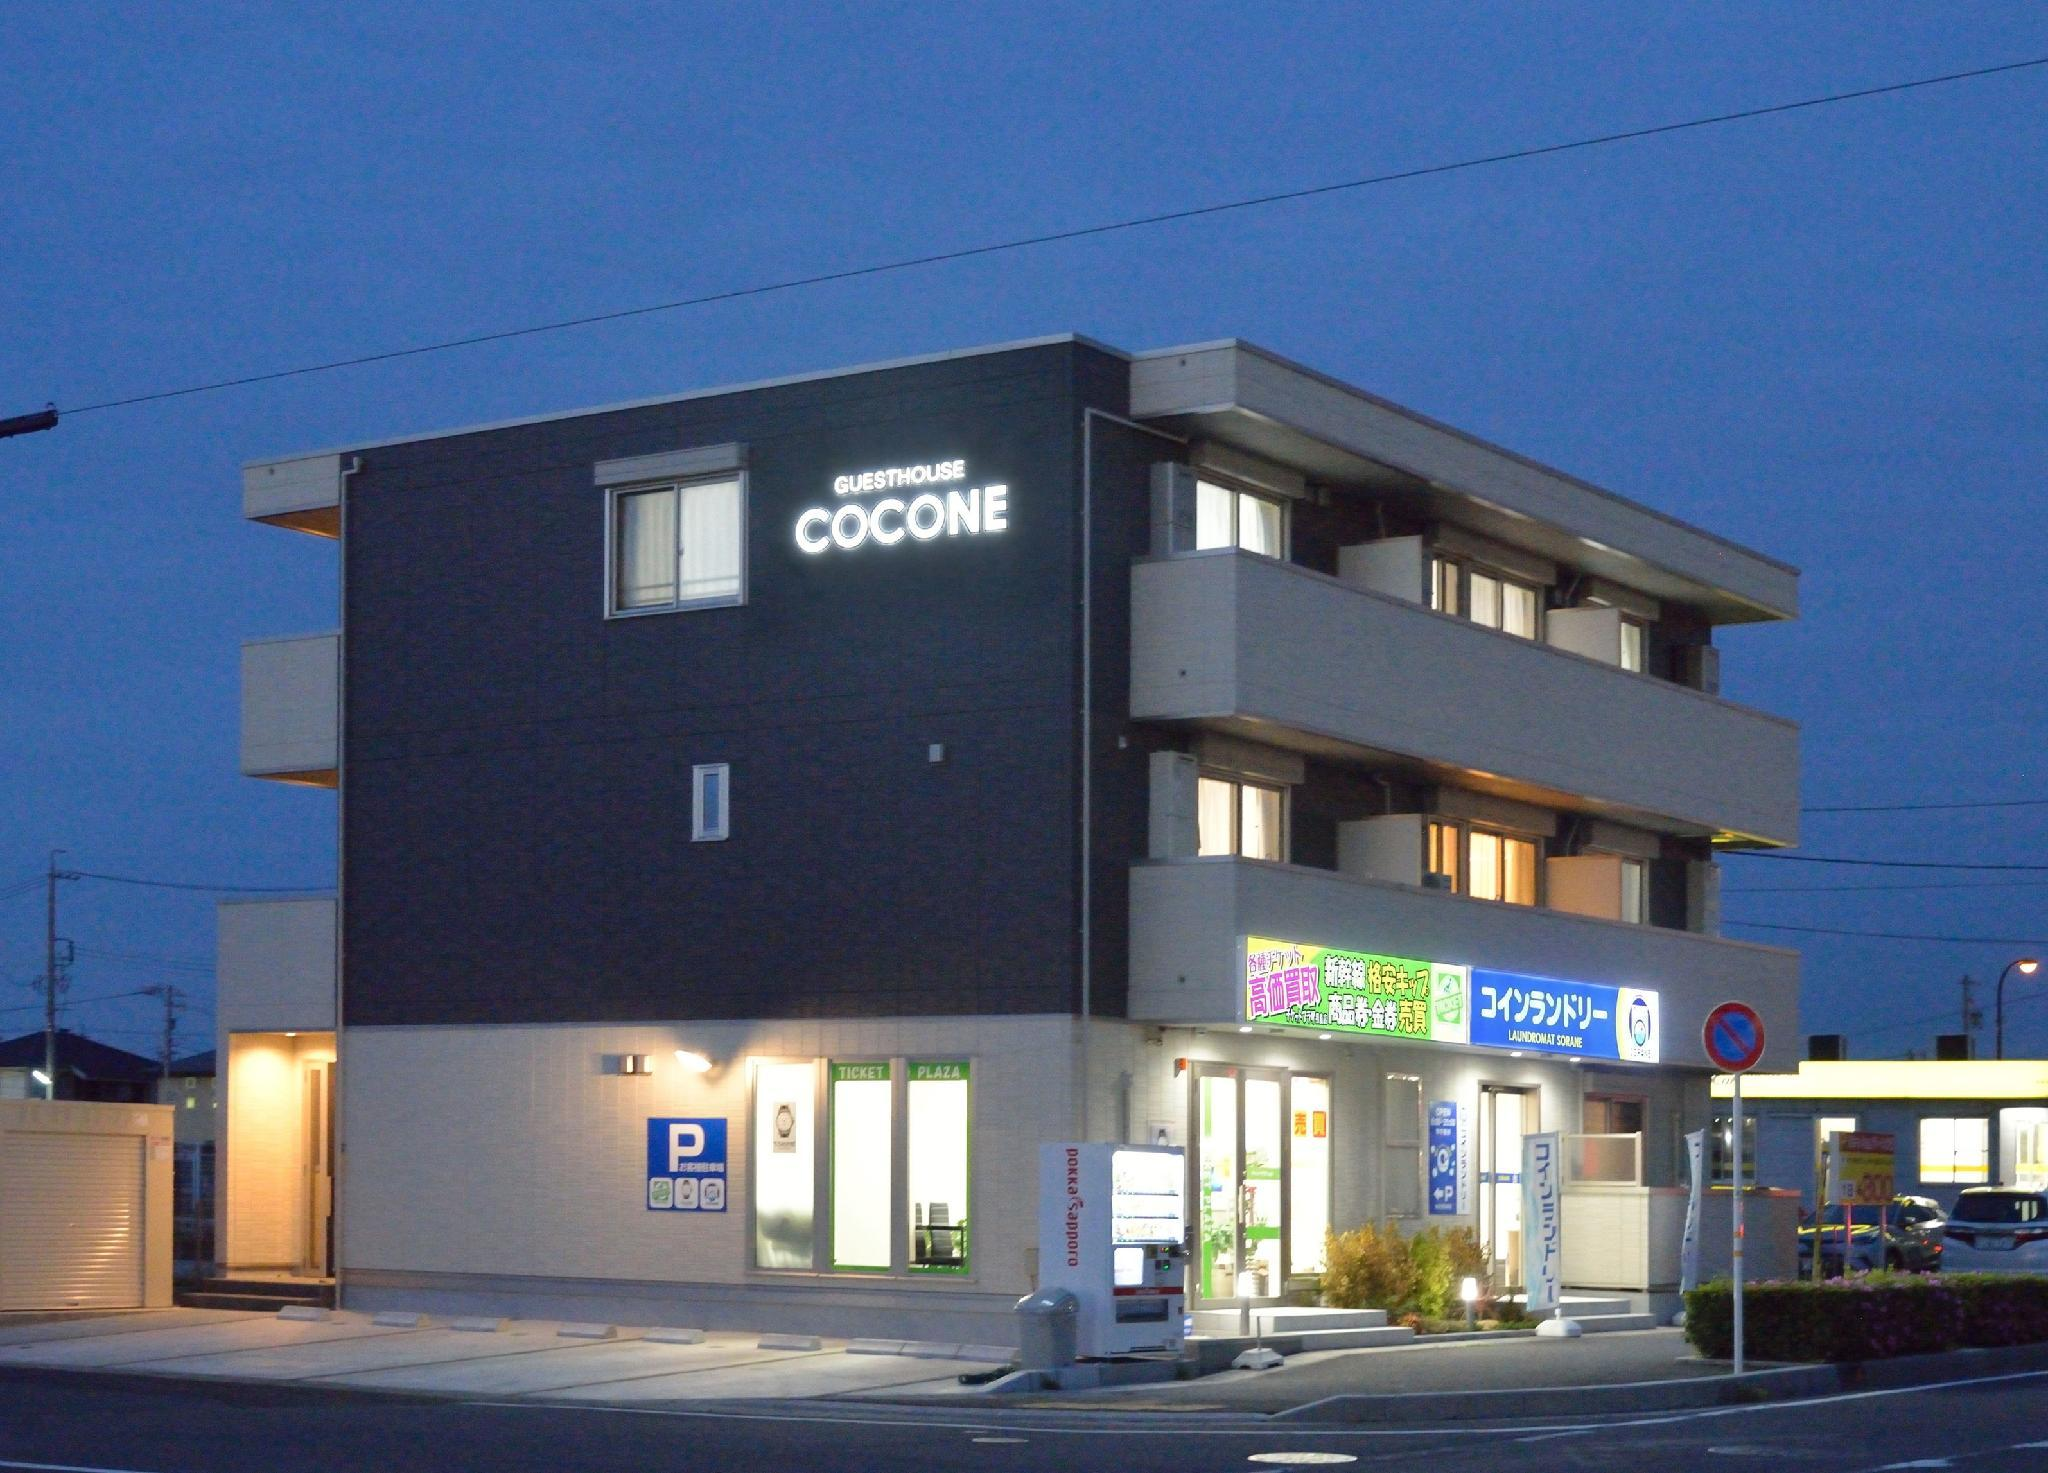 Guest House Gifuhashima COCONE, Hashima